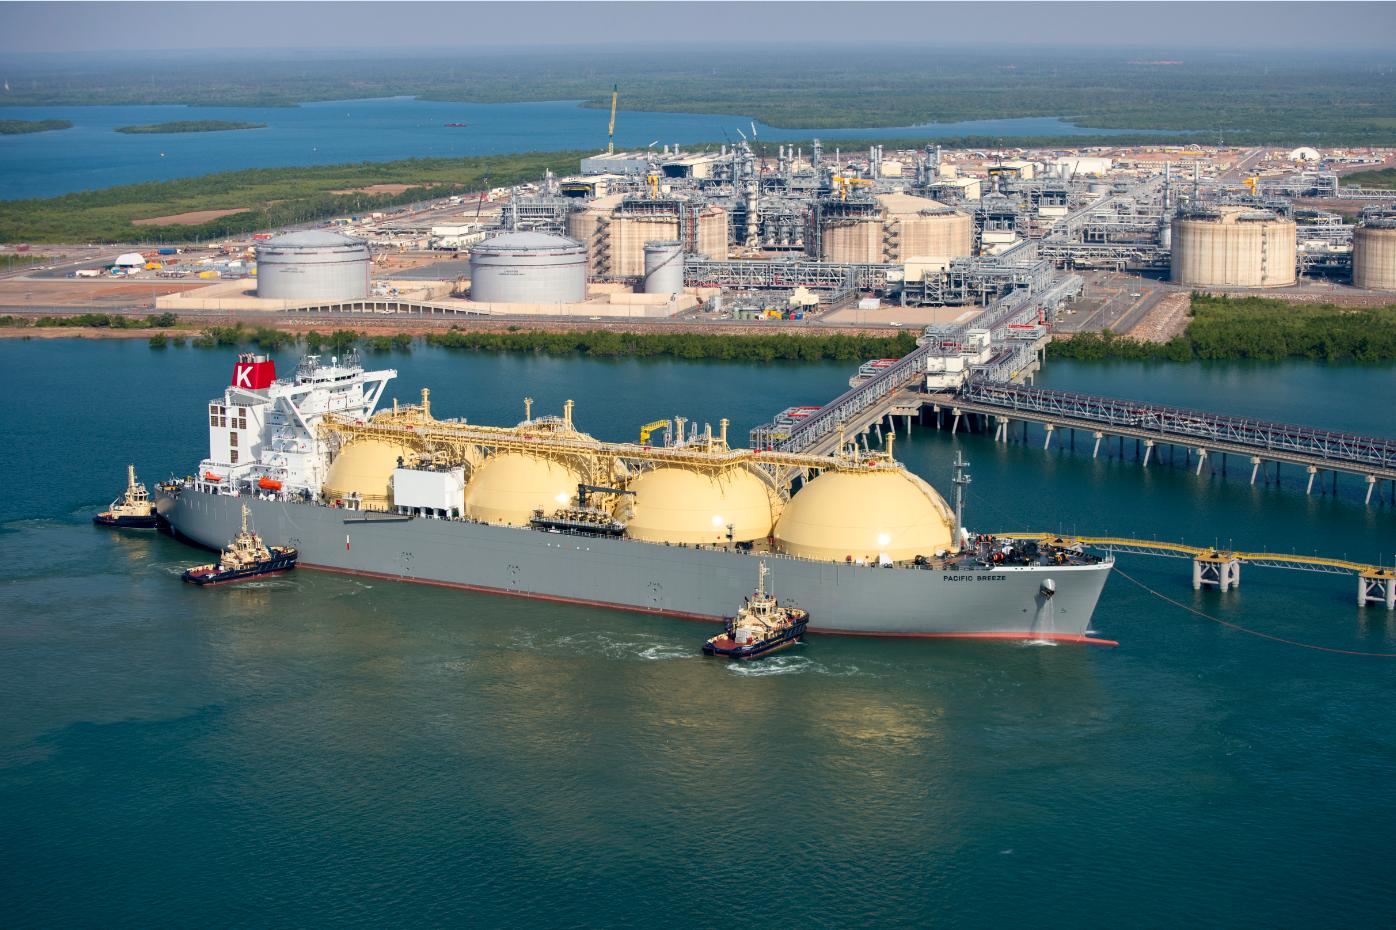 Australia: Ichthys LNG Project Begins Gas Exports   Total.com